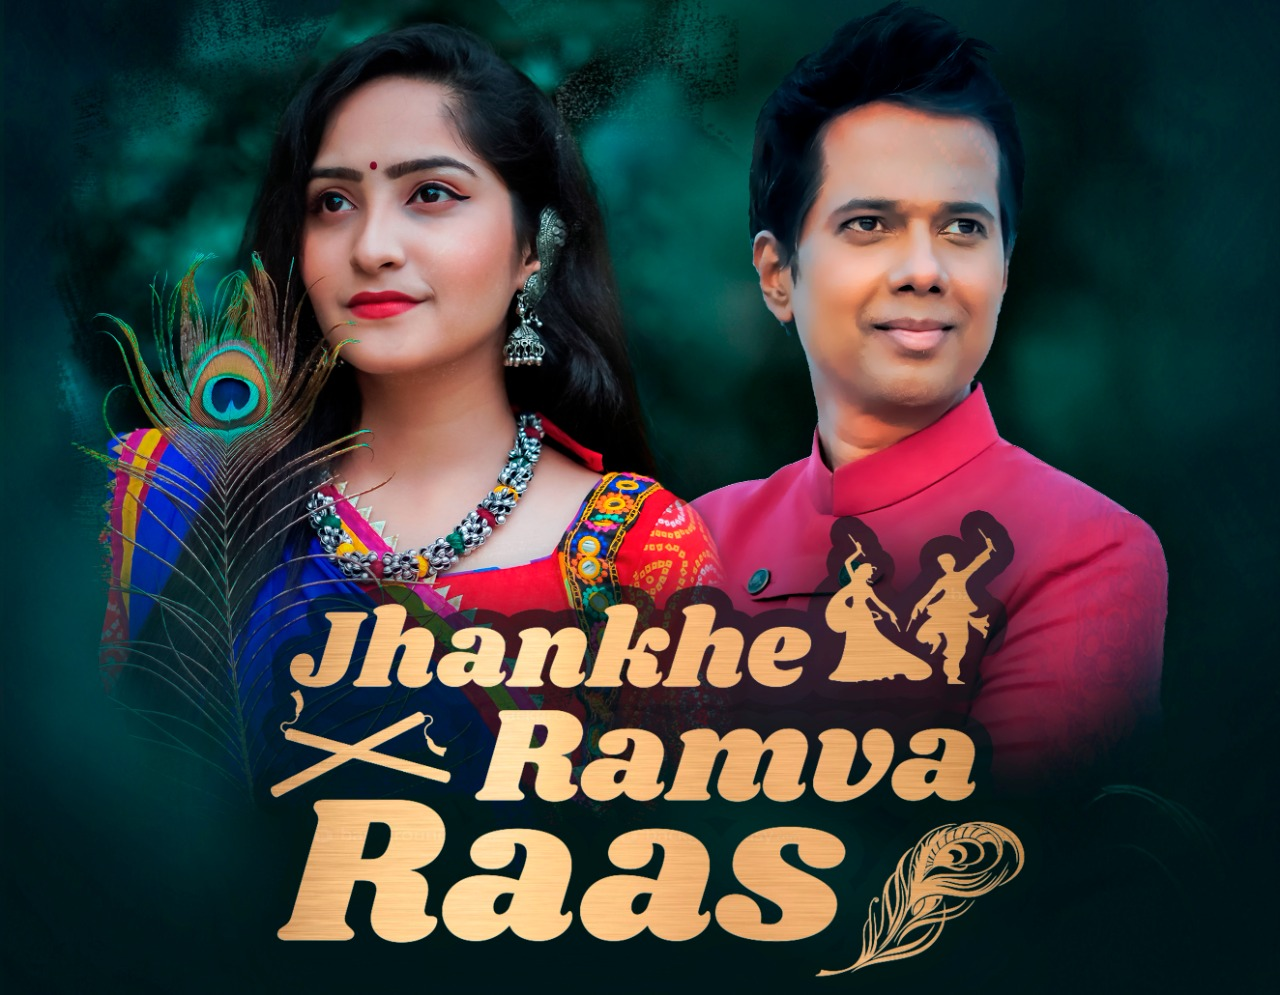 "Photo of બૉલીવુડના પ્લેબેક સિંગર શ્રીરામ ઐયર અને ગુજરાતની લોકપ્રિય ગાયિકા સાંત્વની ત્રિવેદીની જુગલબંધીમાં રજૂ થયું ભાવવિભોર કરનારું ગીત ""ઝંખે રમવા રાસ"""